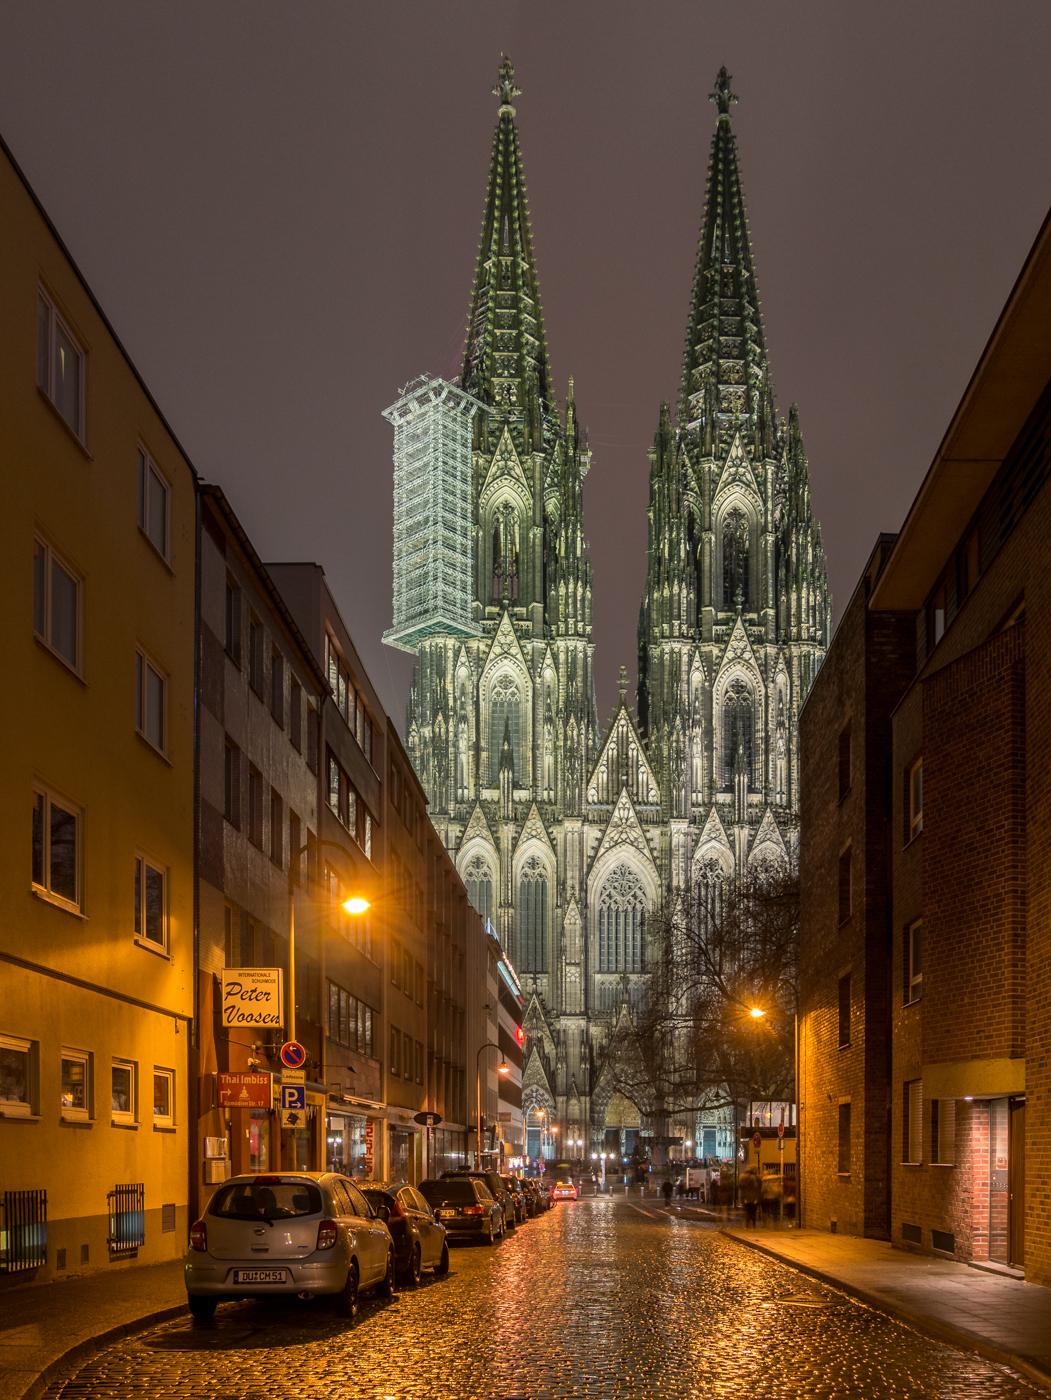 BdM 2018-07 - Köln | © Birgit Ziolkowski